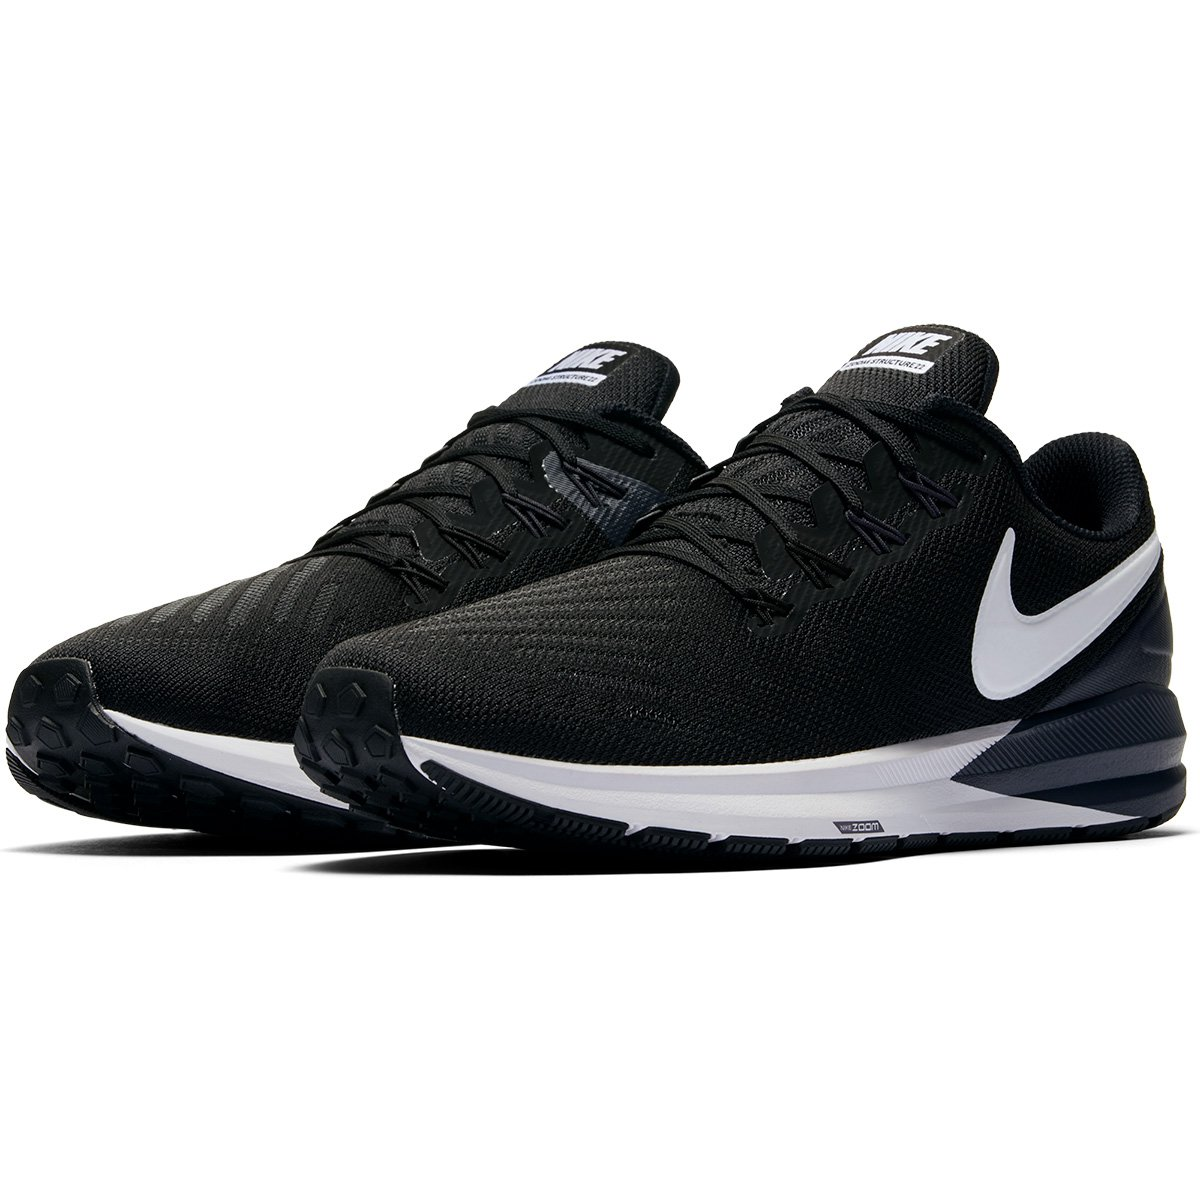 Tênis Nike Air Zoom Structure 22 Masculino - Compre Agora  0456ae20a9628